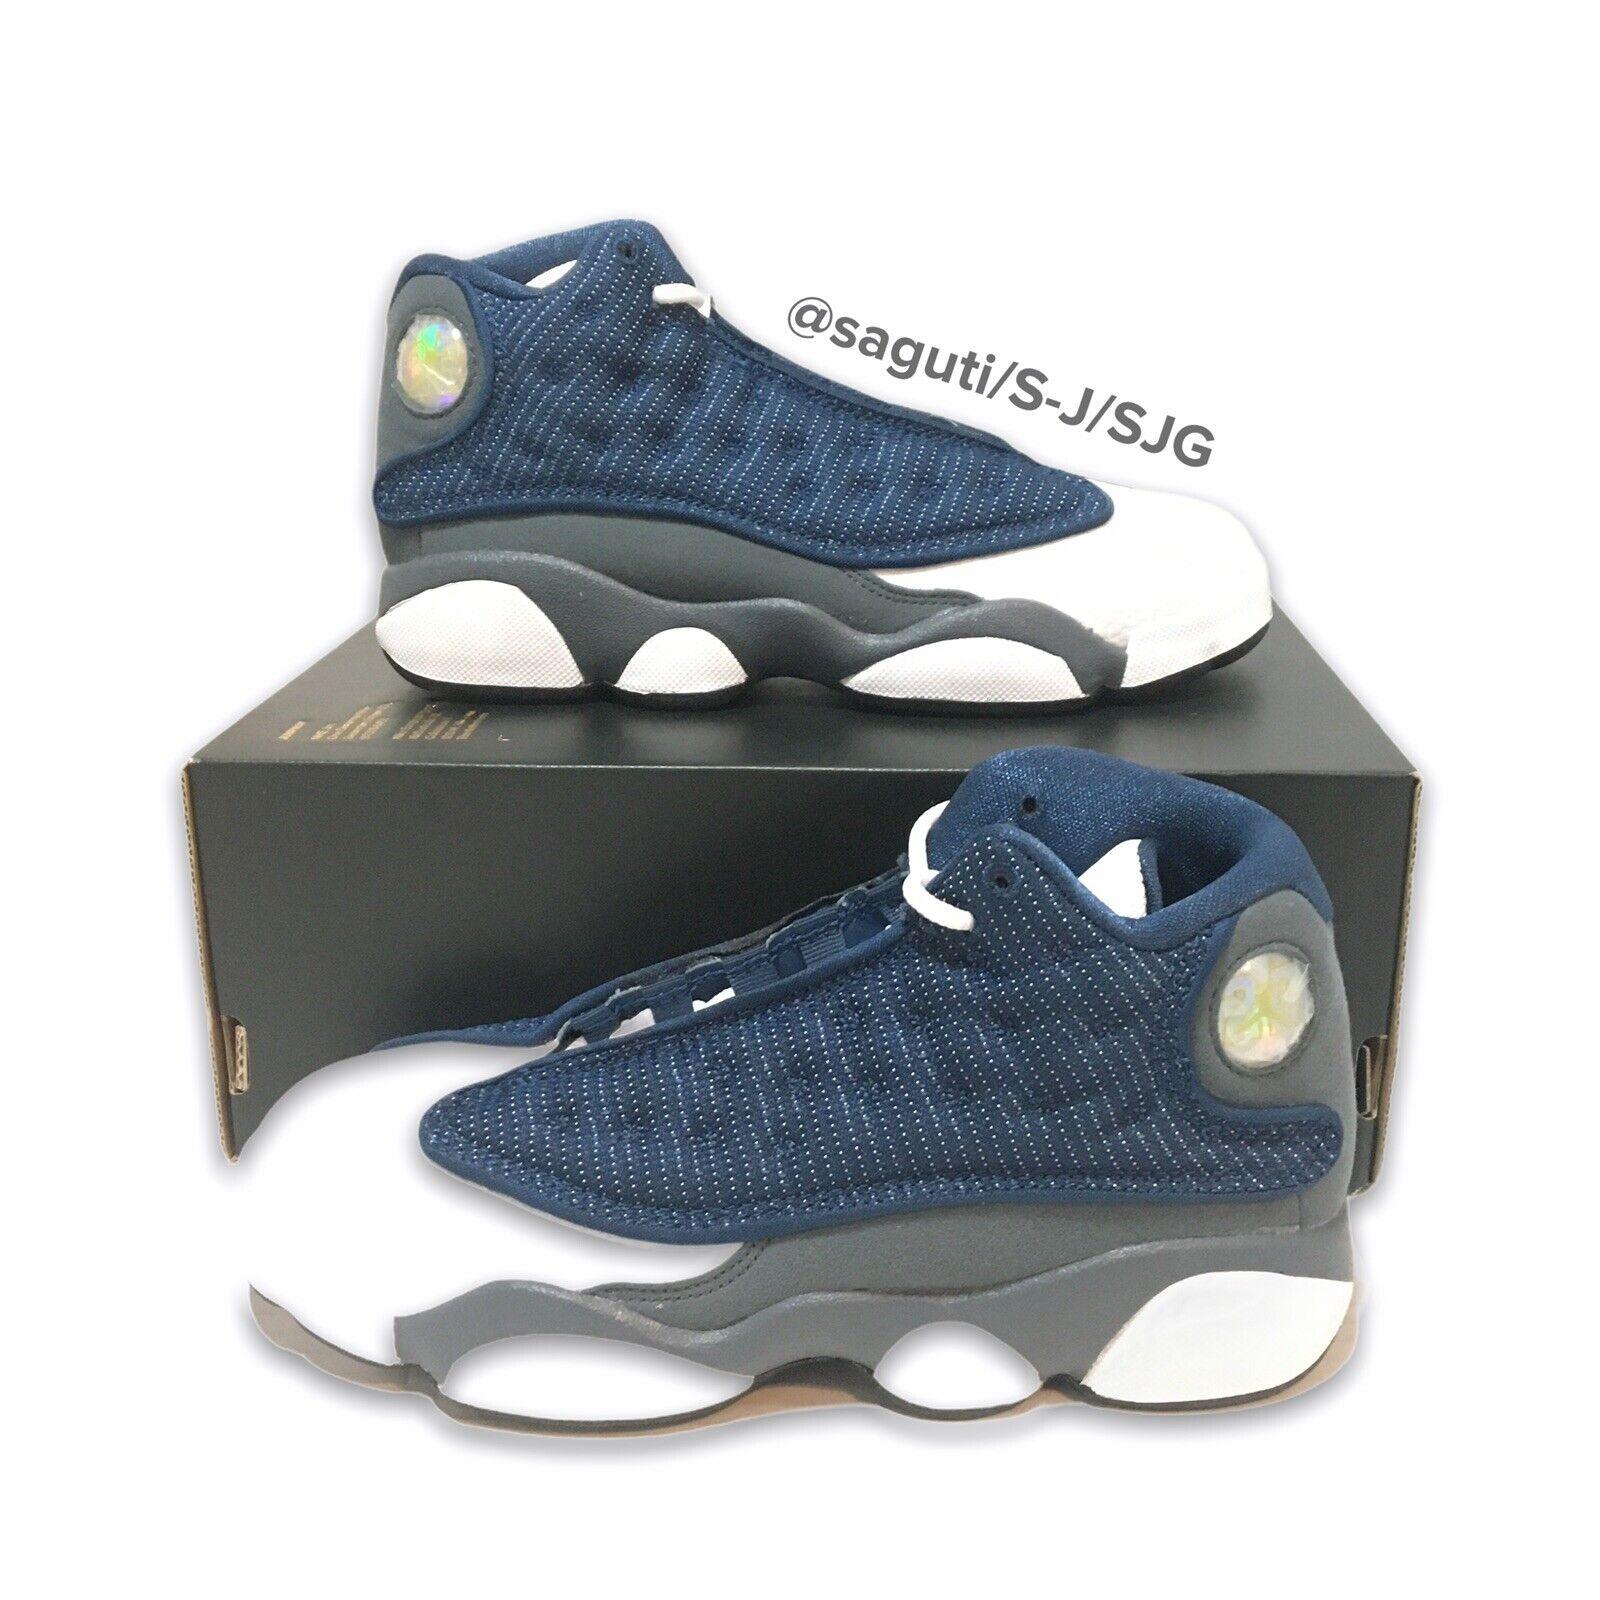 Nike Air Jordan Retro 13 Flint PS Kids Size 2y Shoes 414575-404